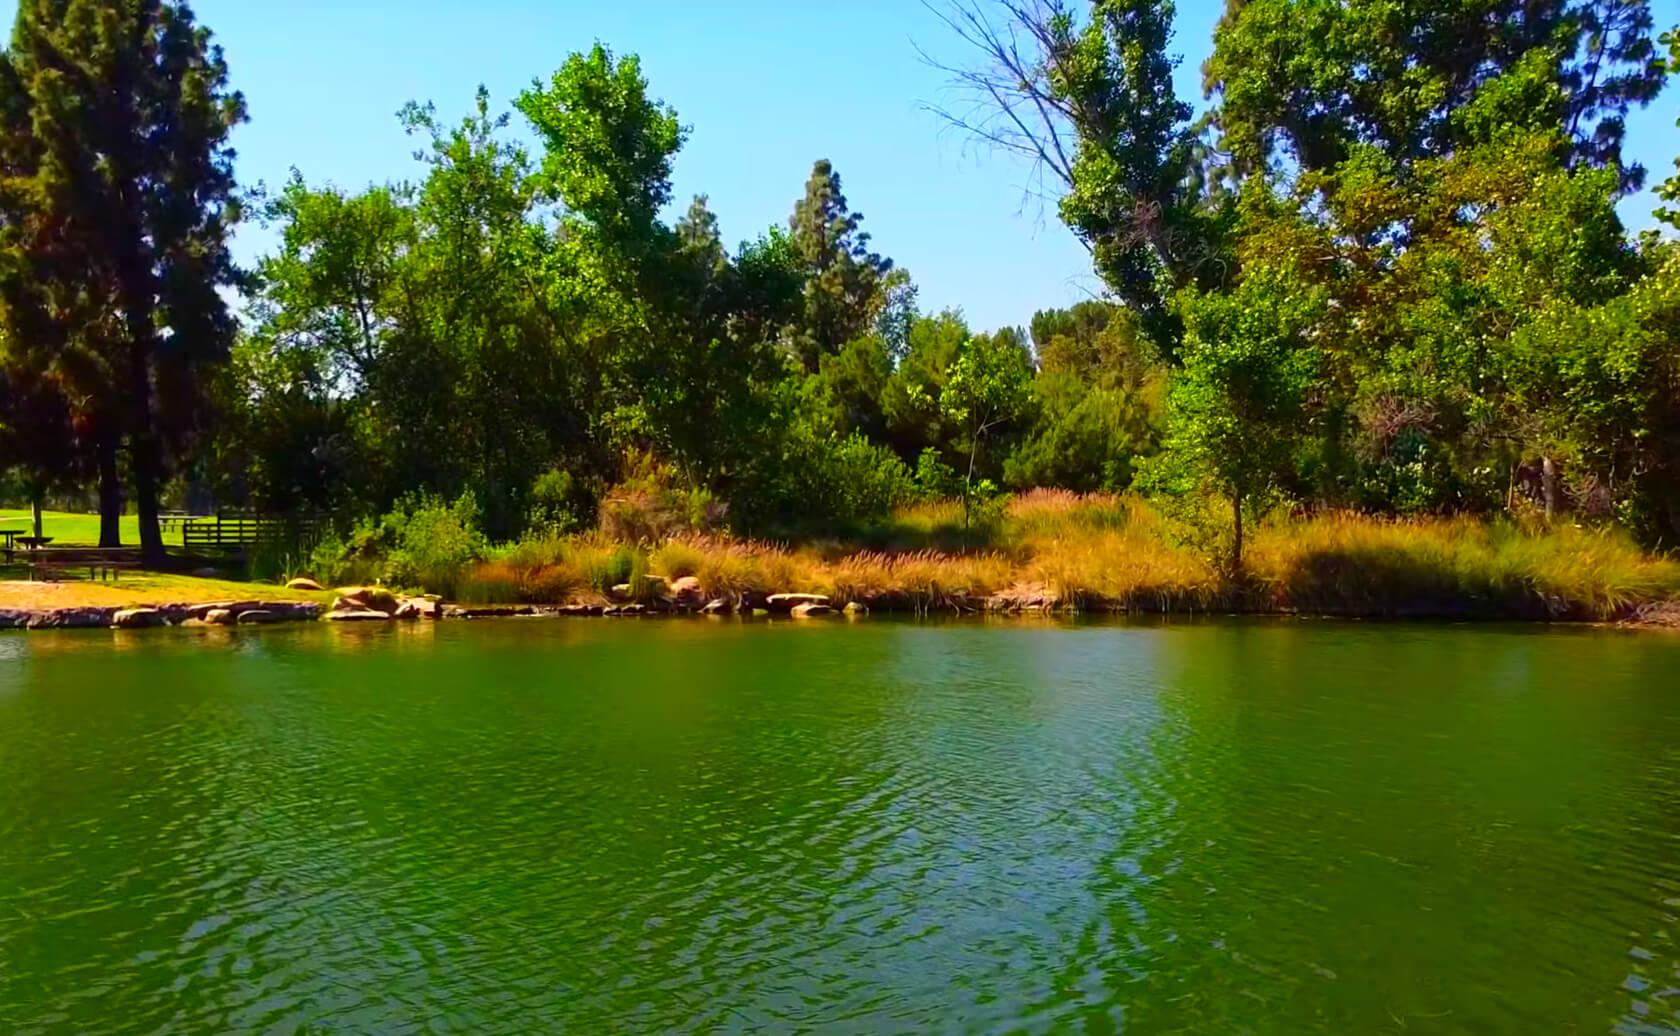 Yorba-Regional-Park-Lake-Fishing-Guide-Report-Anaheim-CA-01 Copy 8